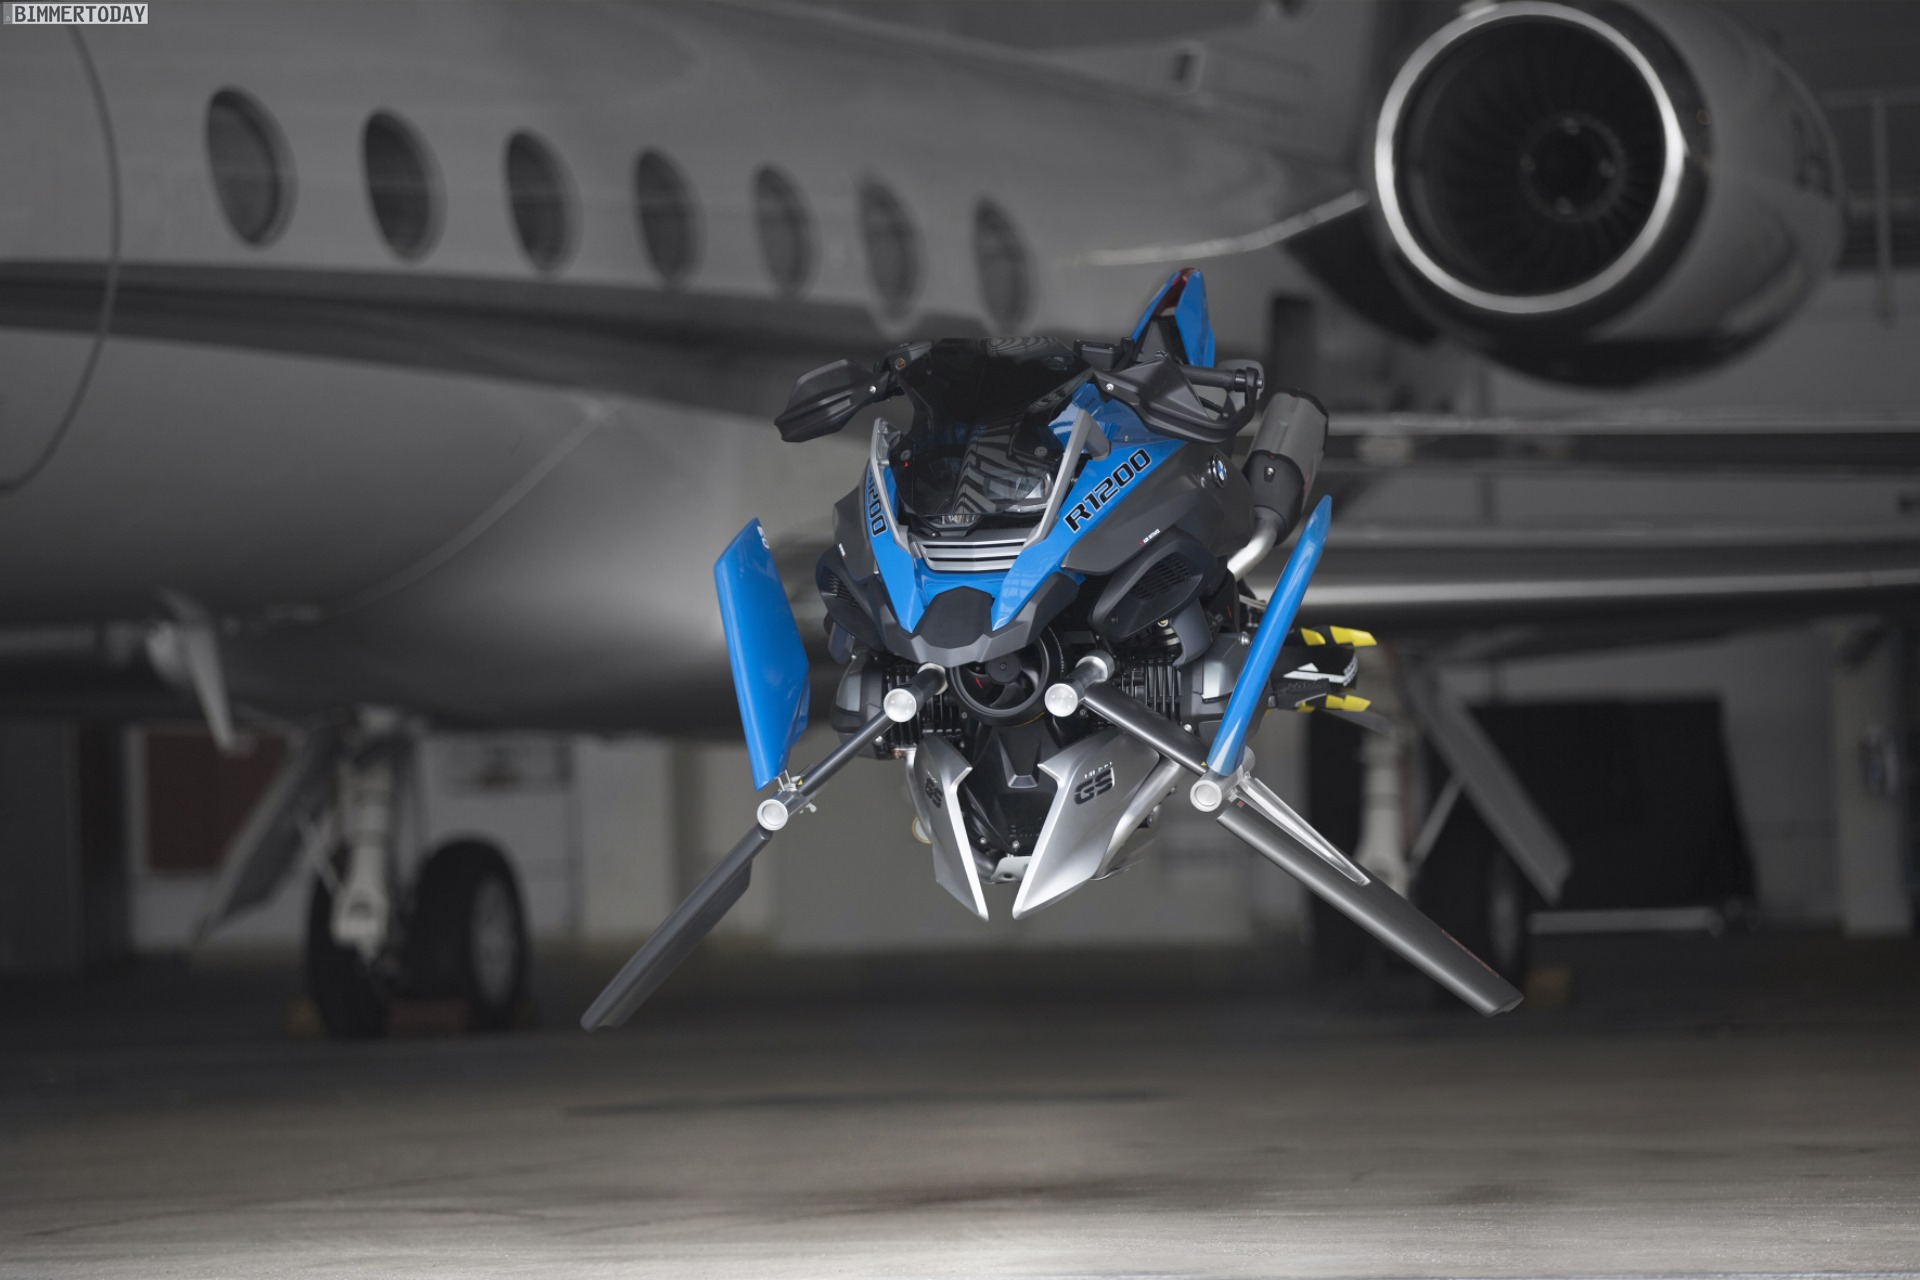 Bmw Motorrad Und Lego Bauen Hover Bike Im Ma 223 Stab 1 1